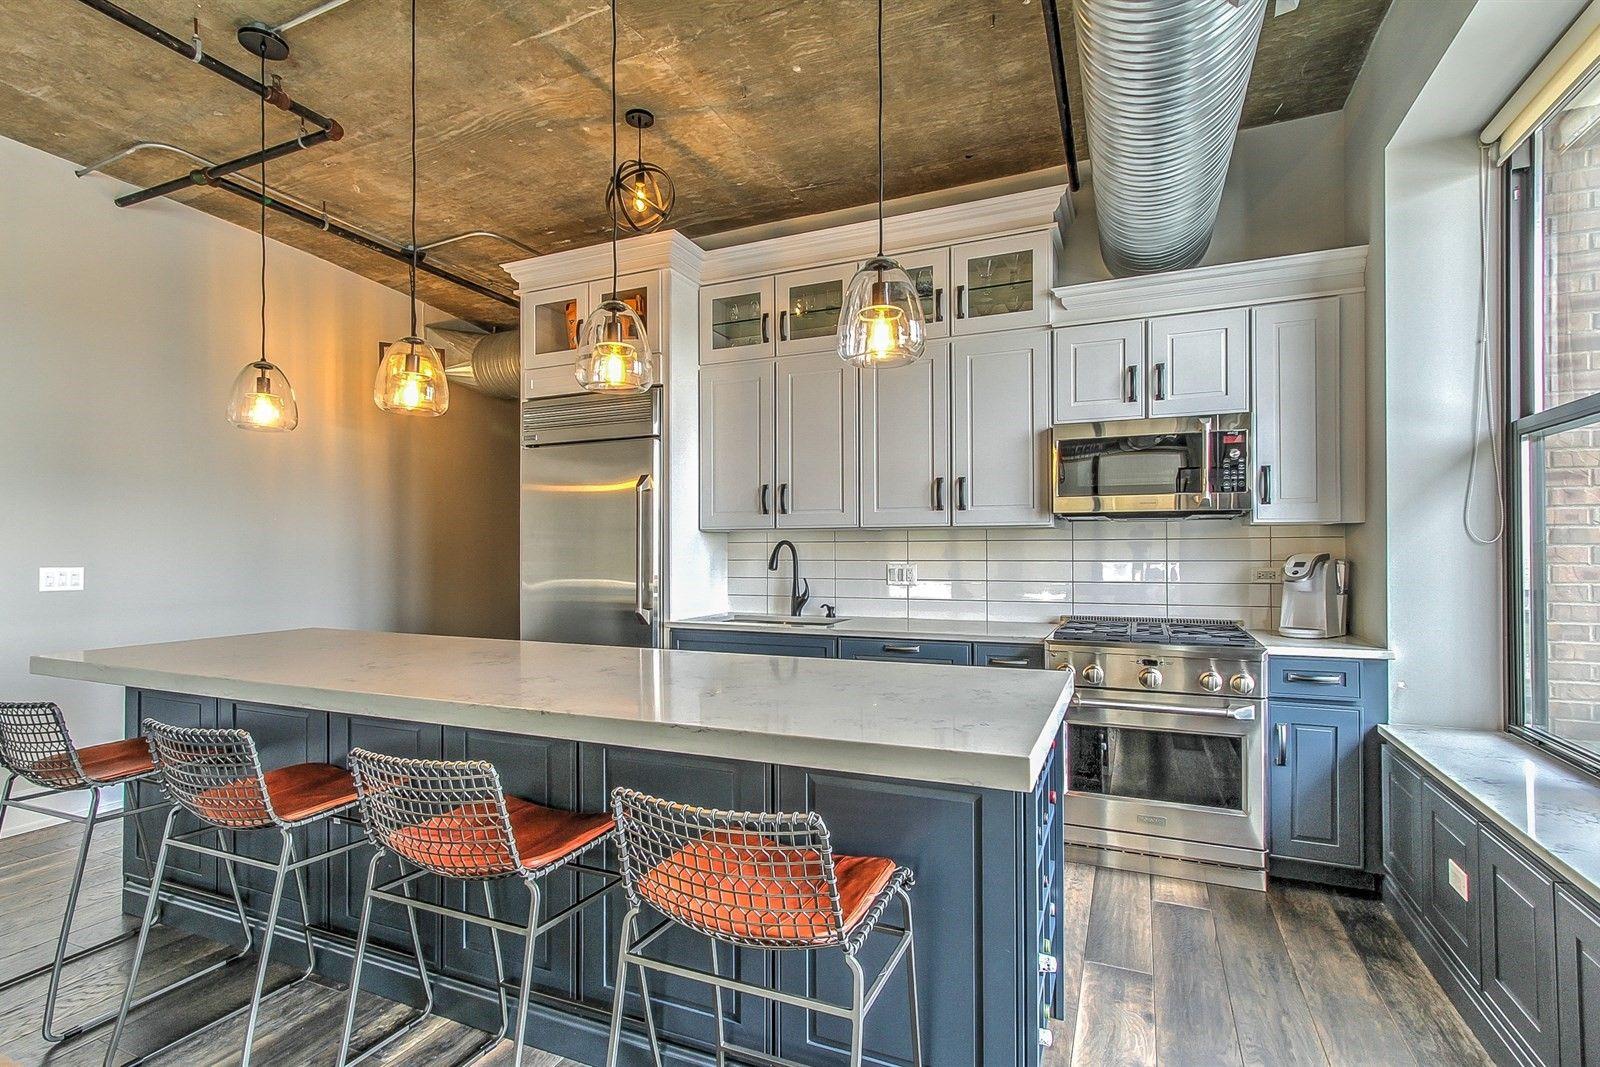 Best Cabinets Kitchen Cabinets In Bathroom Kitchen And Bath 400 x 300